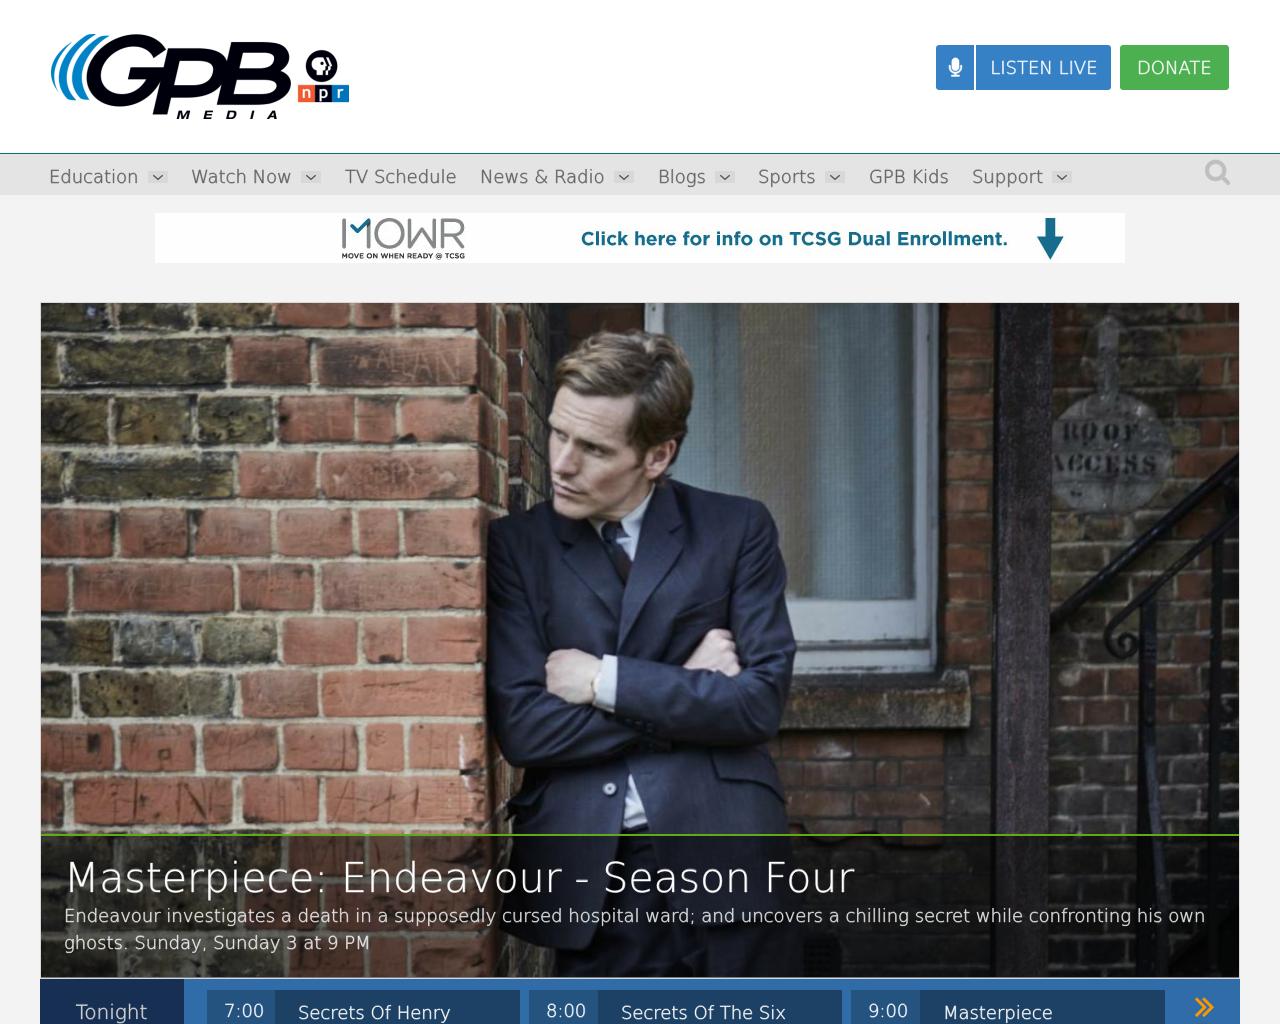 GPB-MEDIA-Advertising-Reviews-Pricing